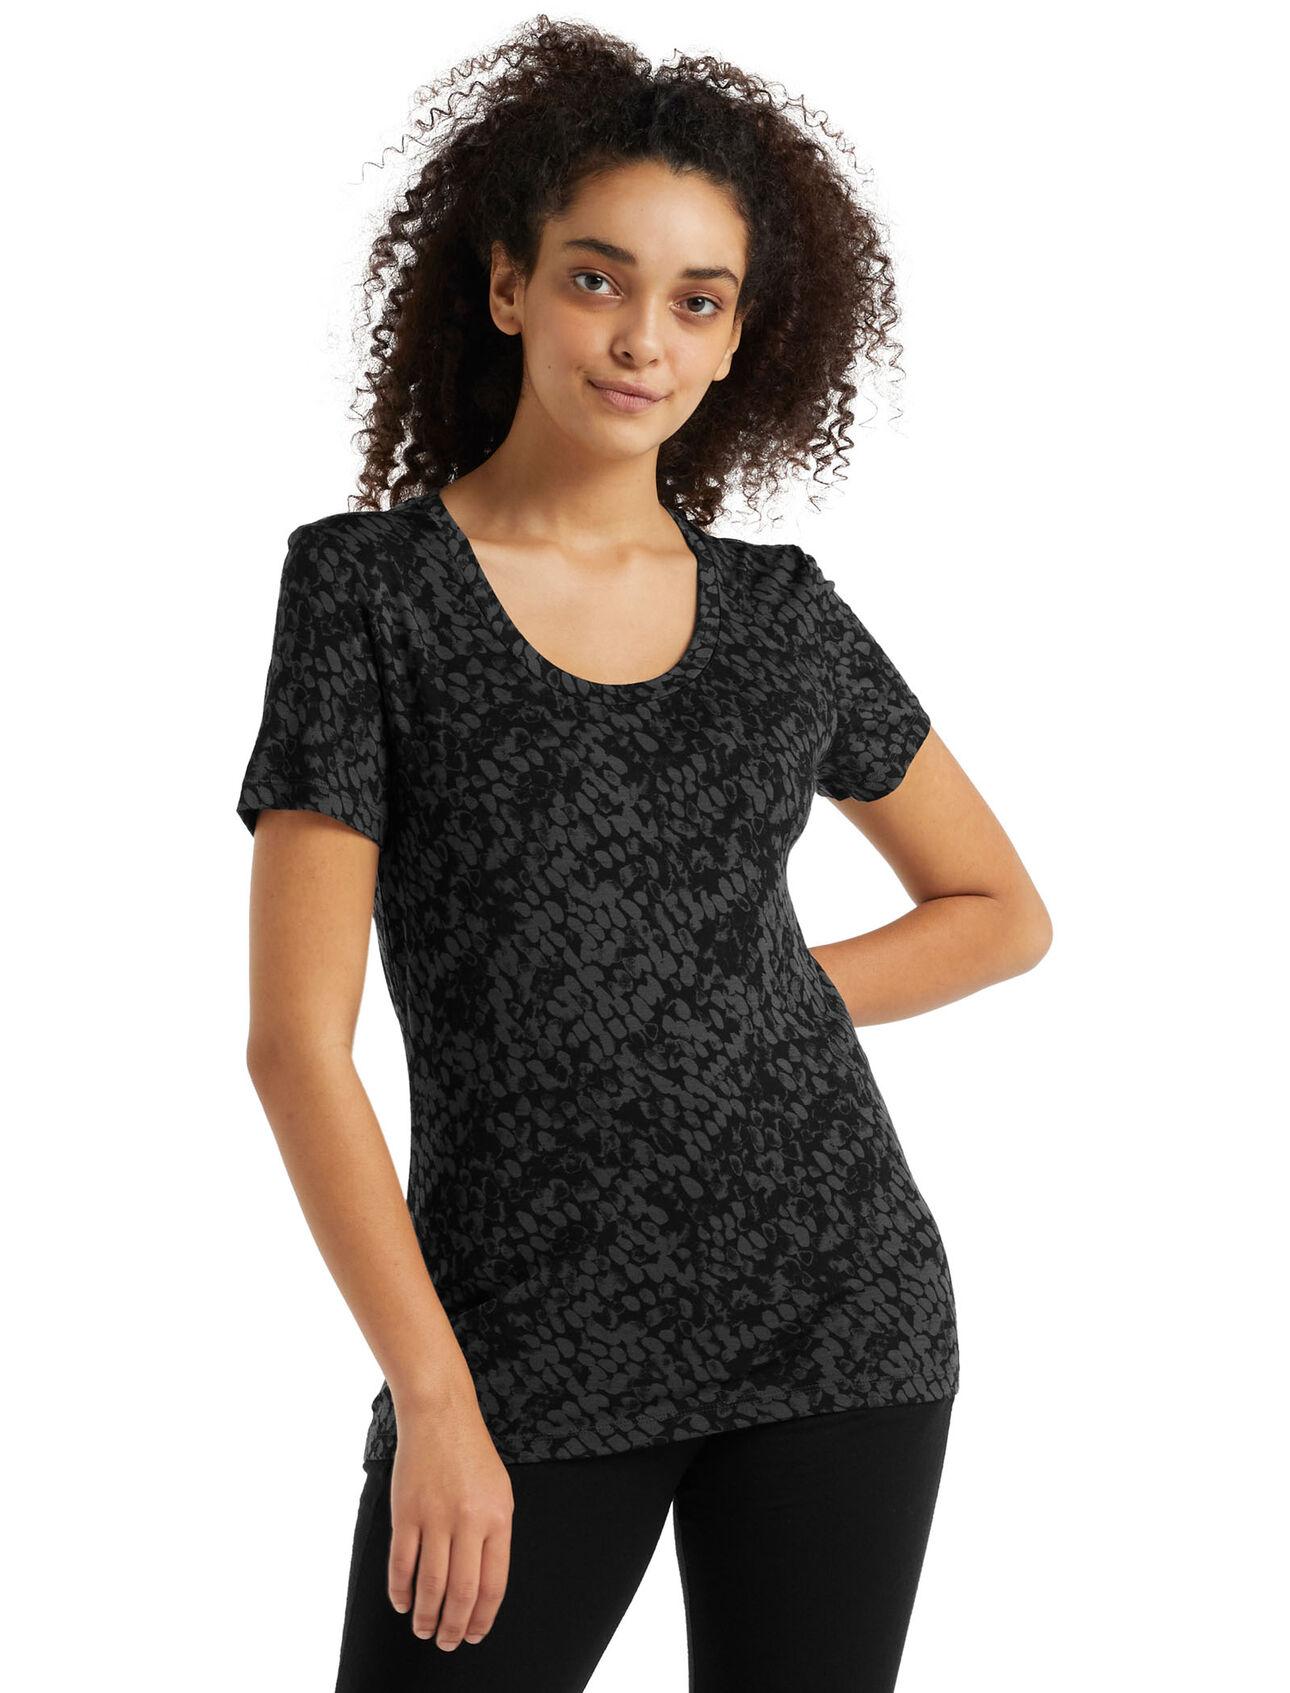 Merino Tech Lite II Short Sleeve Scoop Neck T-Shirt Forest Shadows